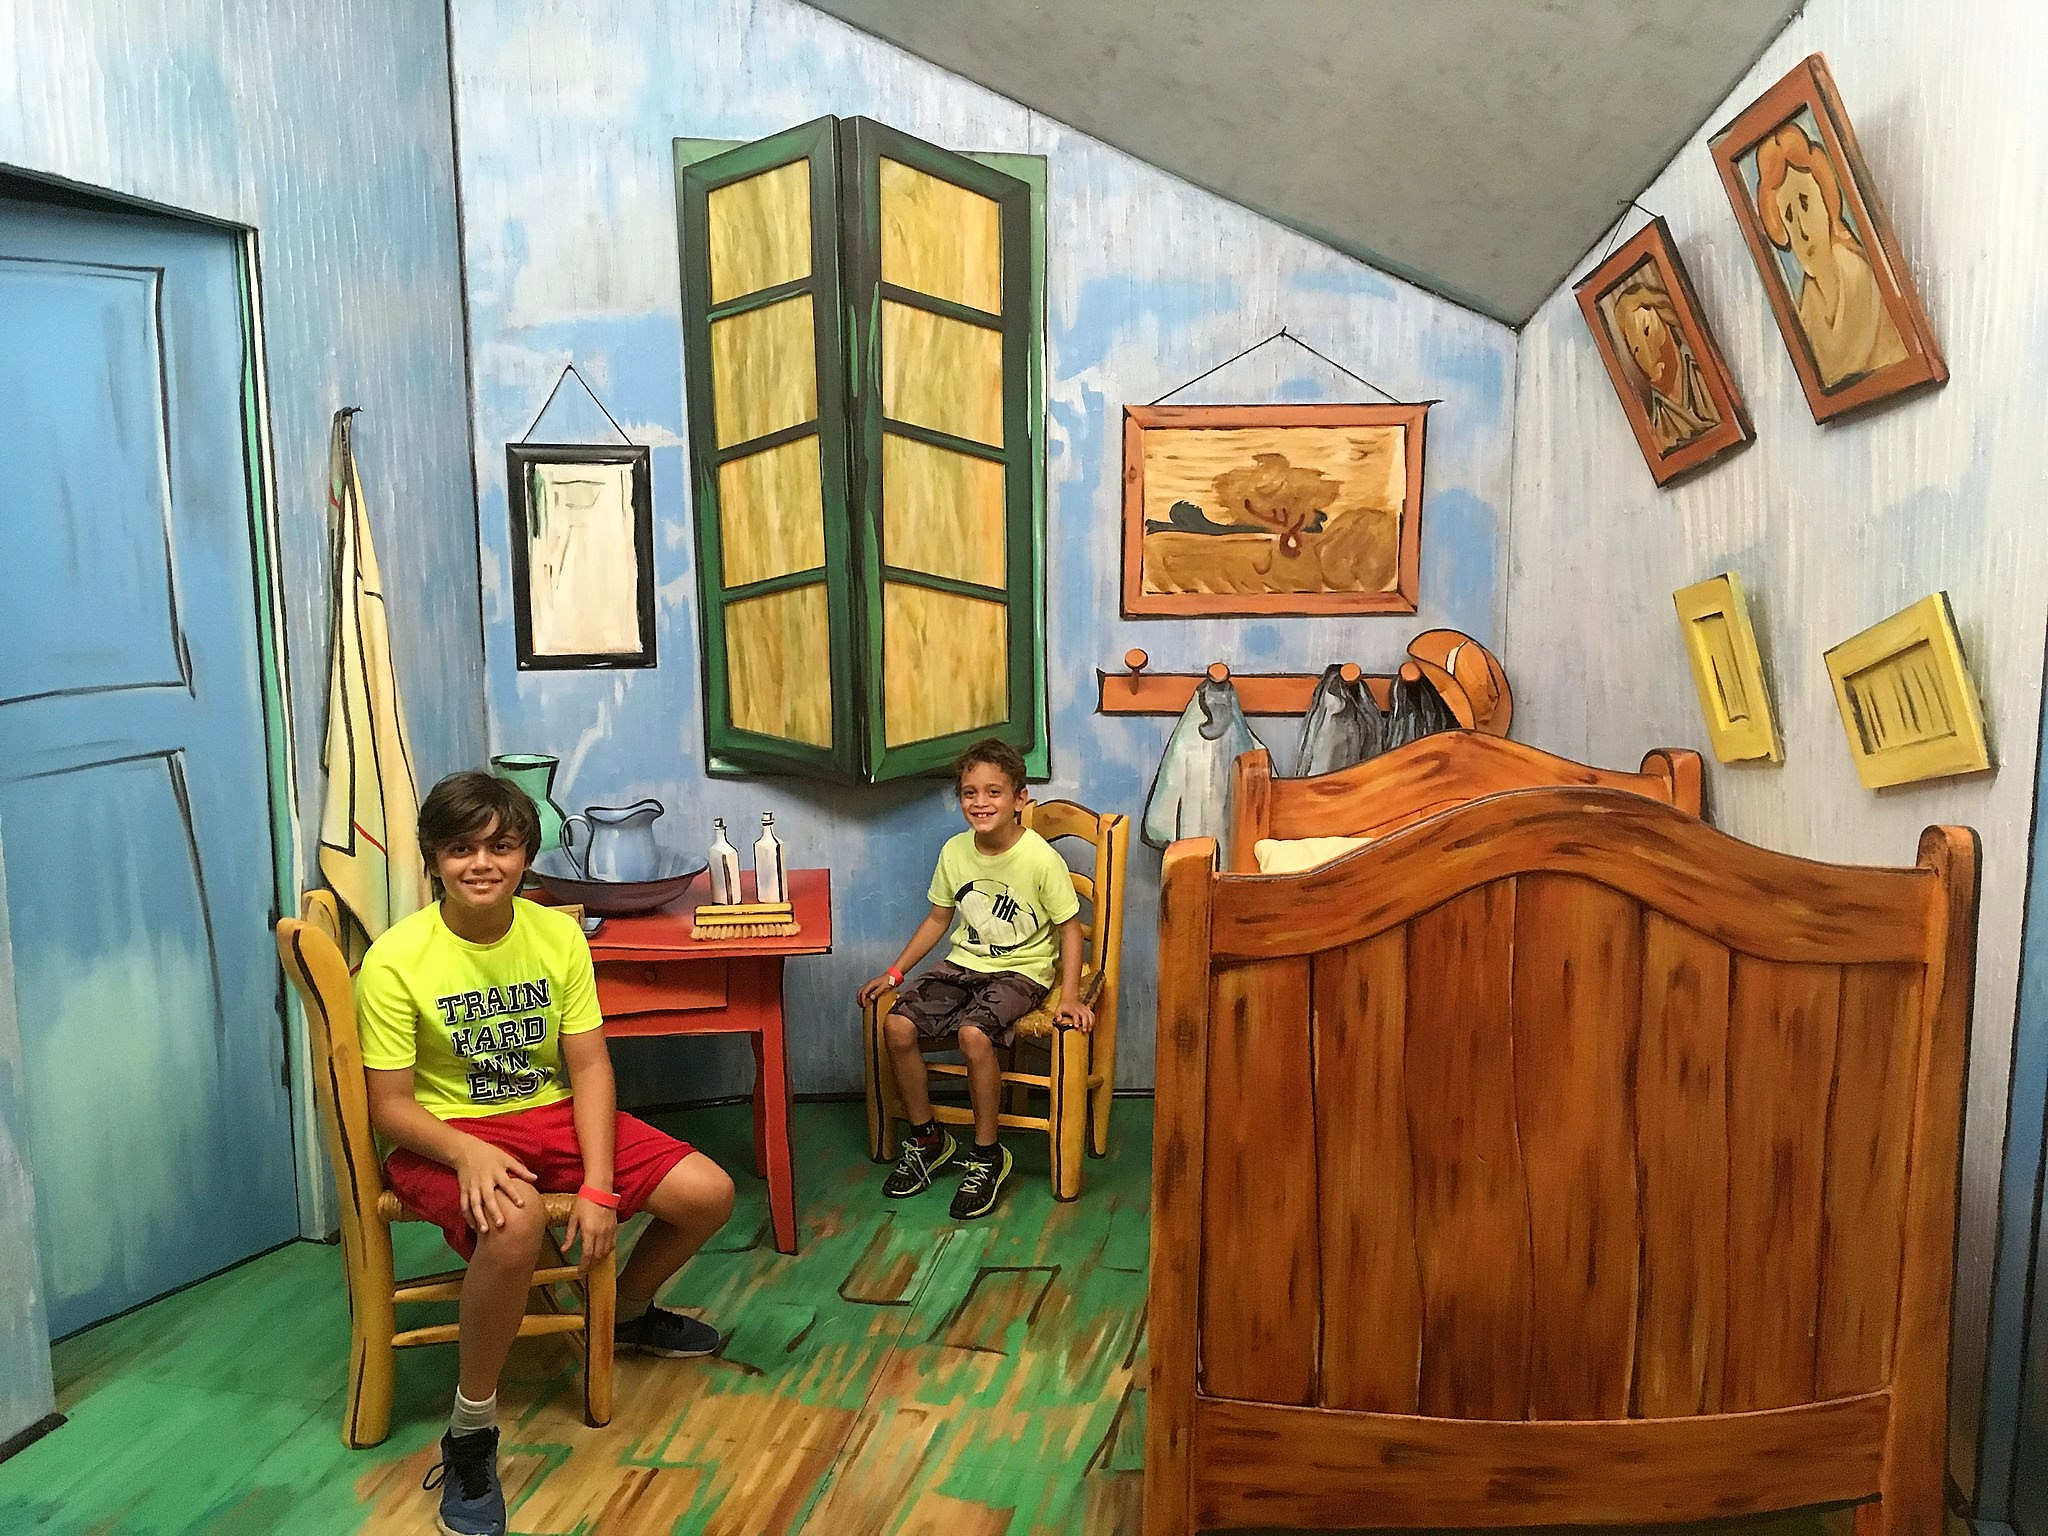 art appreciation and immersion for kids at Sculpture Garden - garden of sculptures - Van Gogh